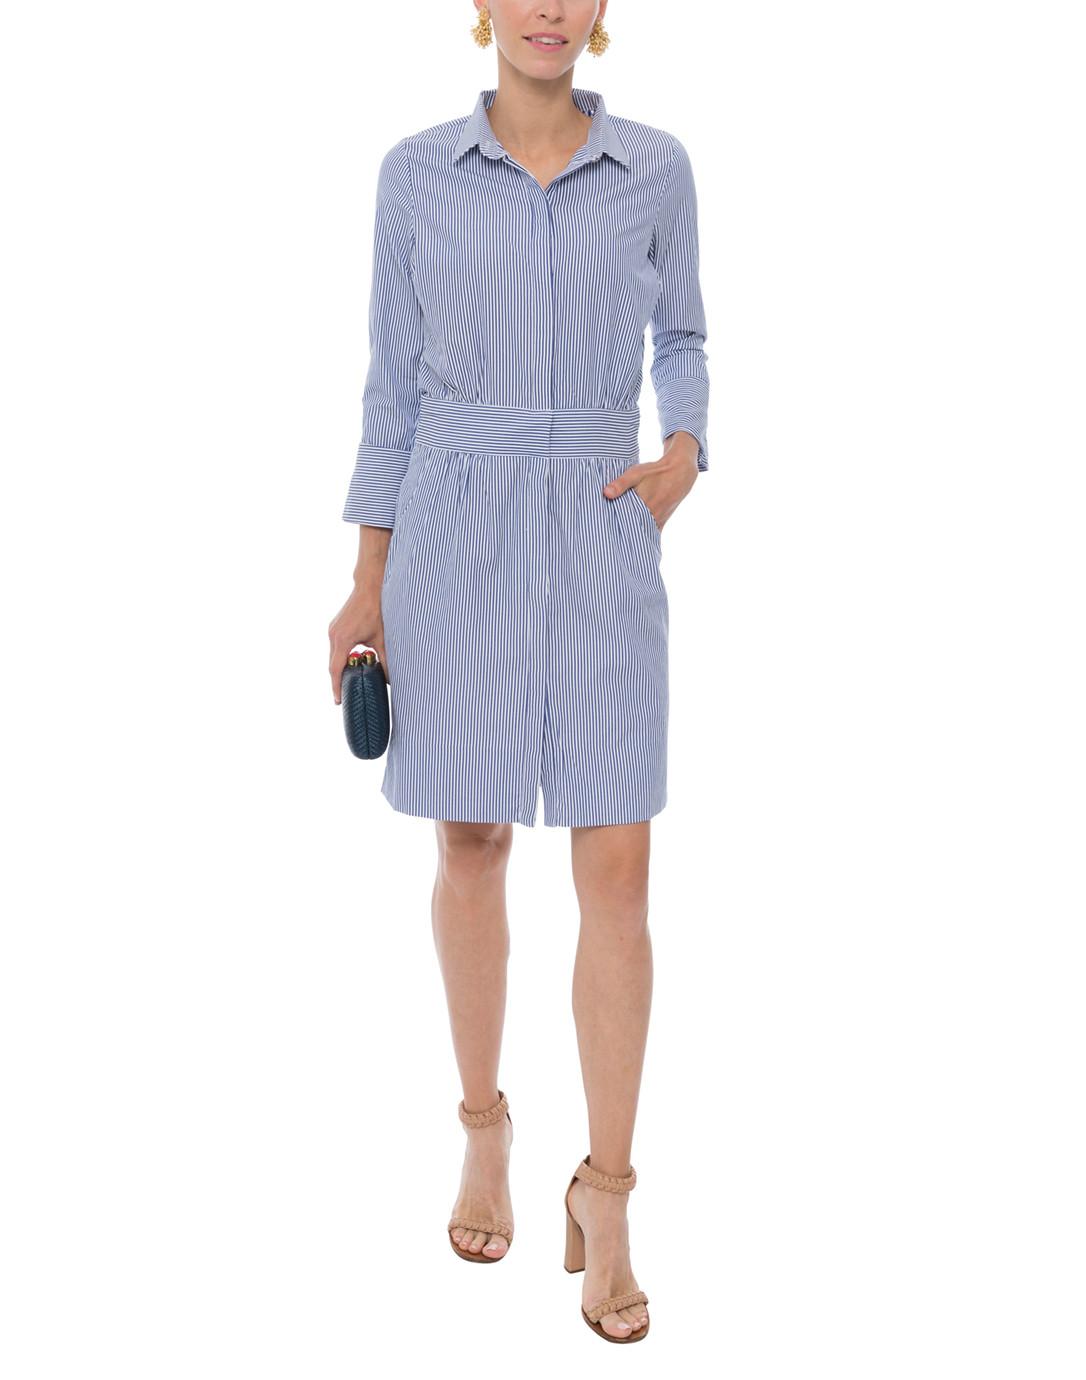 1ade9d6eb4 Breezy Blouson Navy and White Striped Shirt Dress